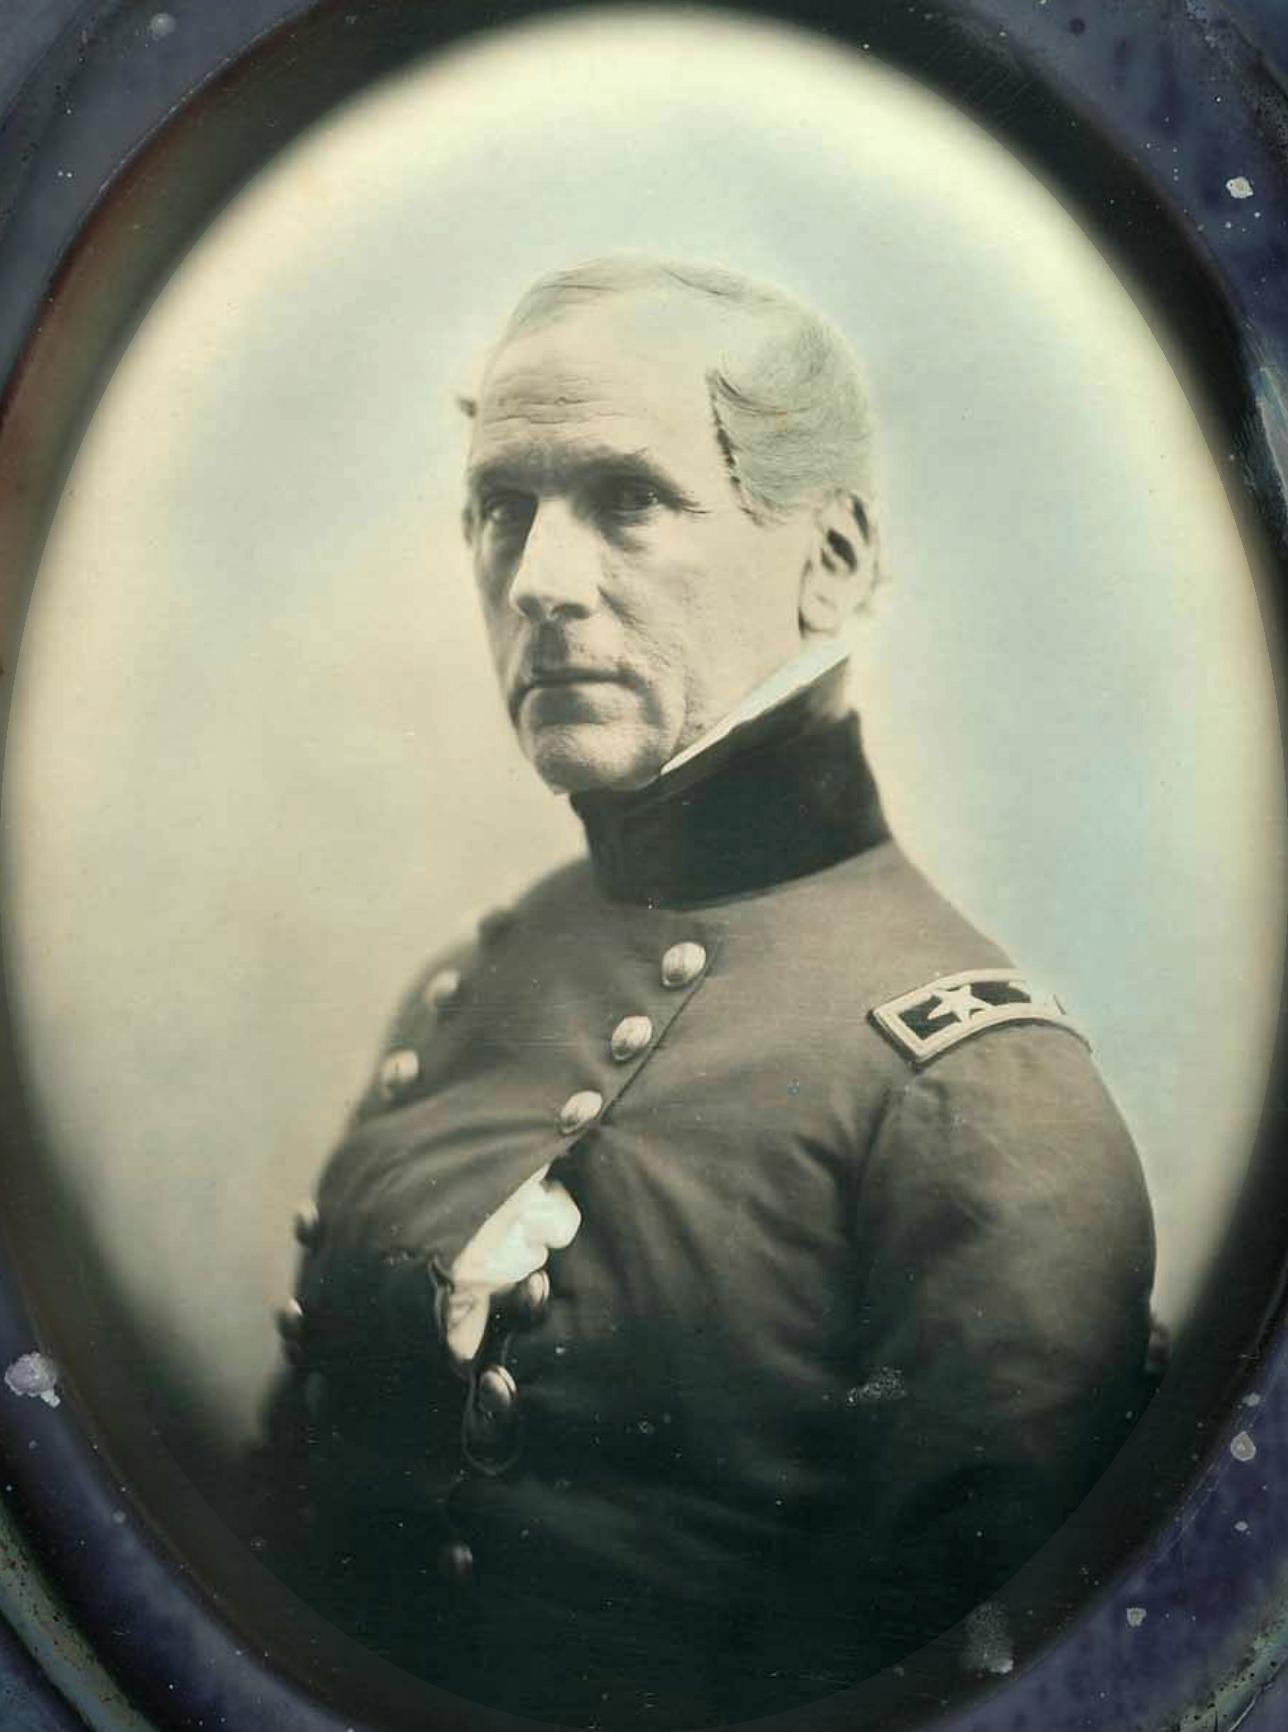 [[Daguerreotype]] of General John E. Wool by [[Southworth & Hawes]]